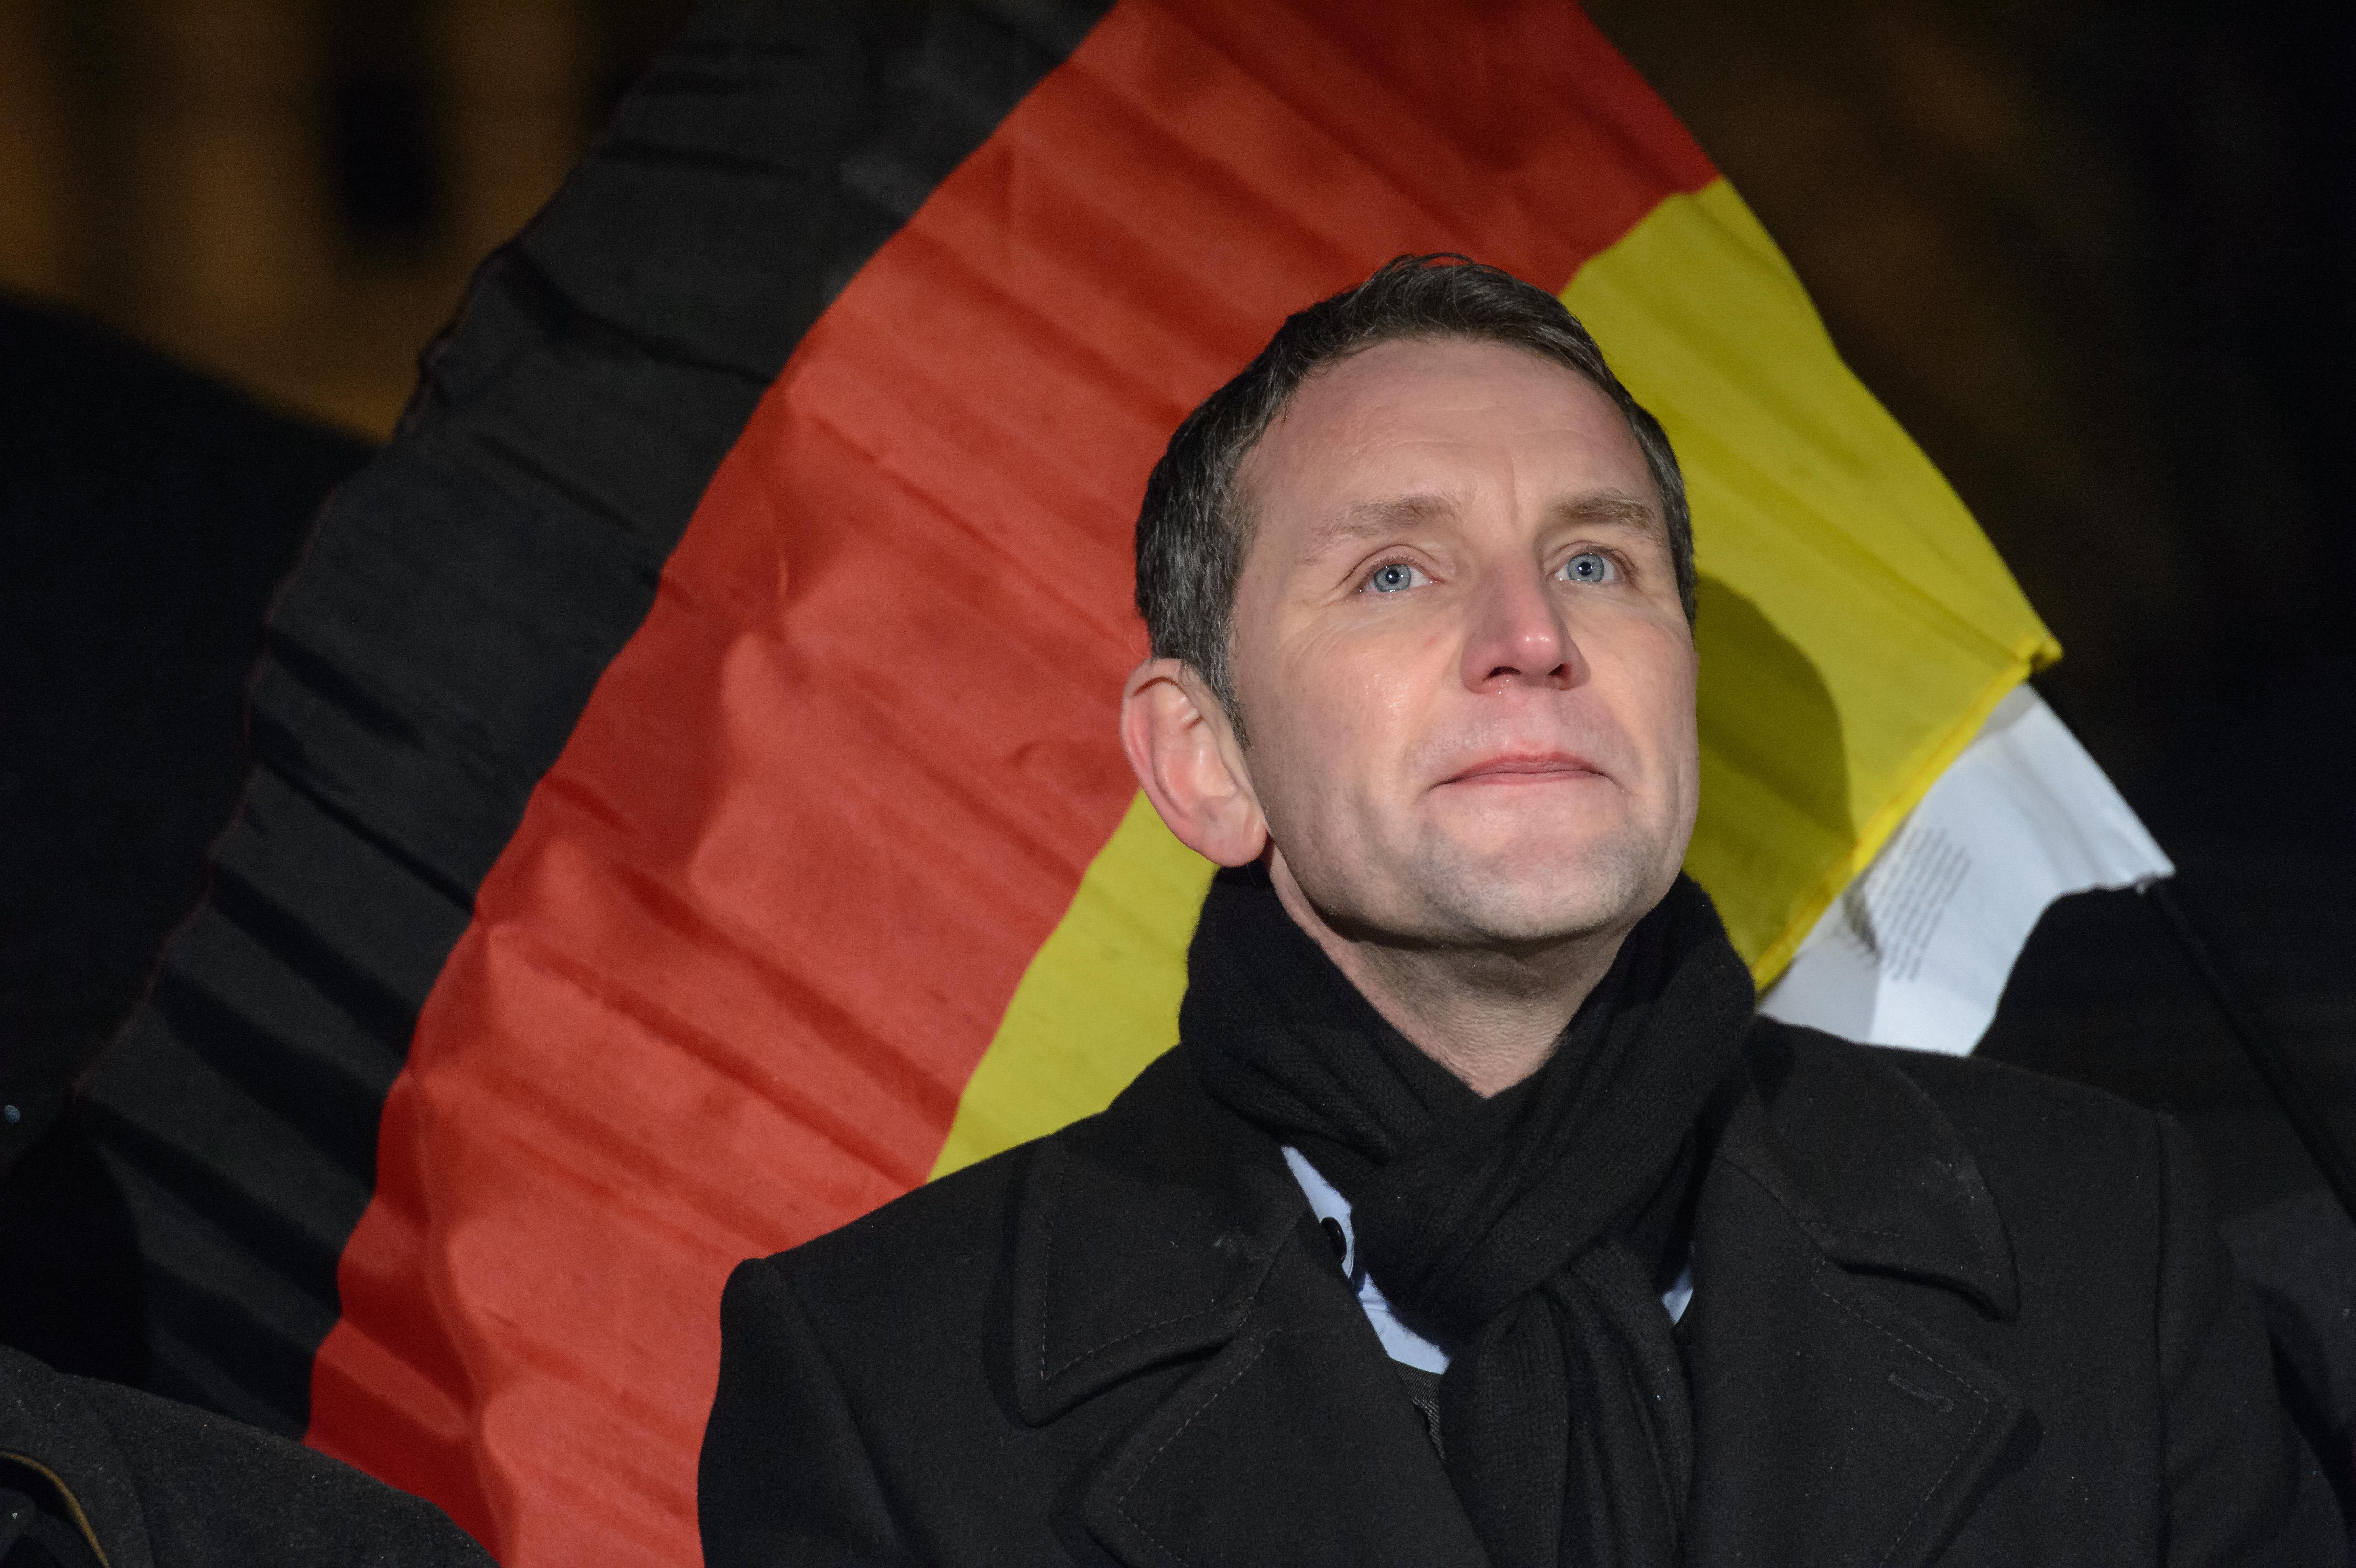 Immunität des Thüringer AfD-Fraktionsvorsitzenden Höcke aufgehoben